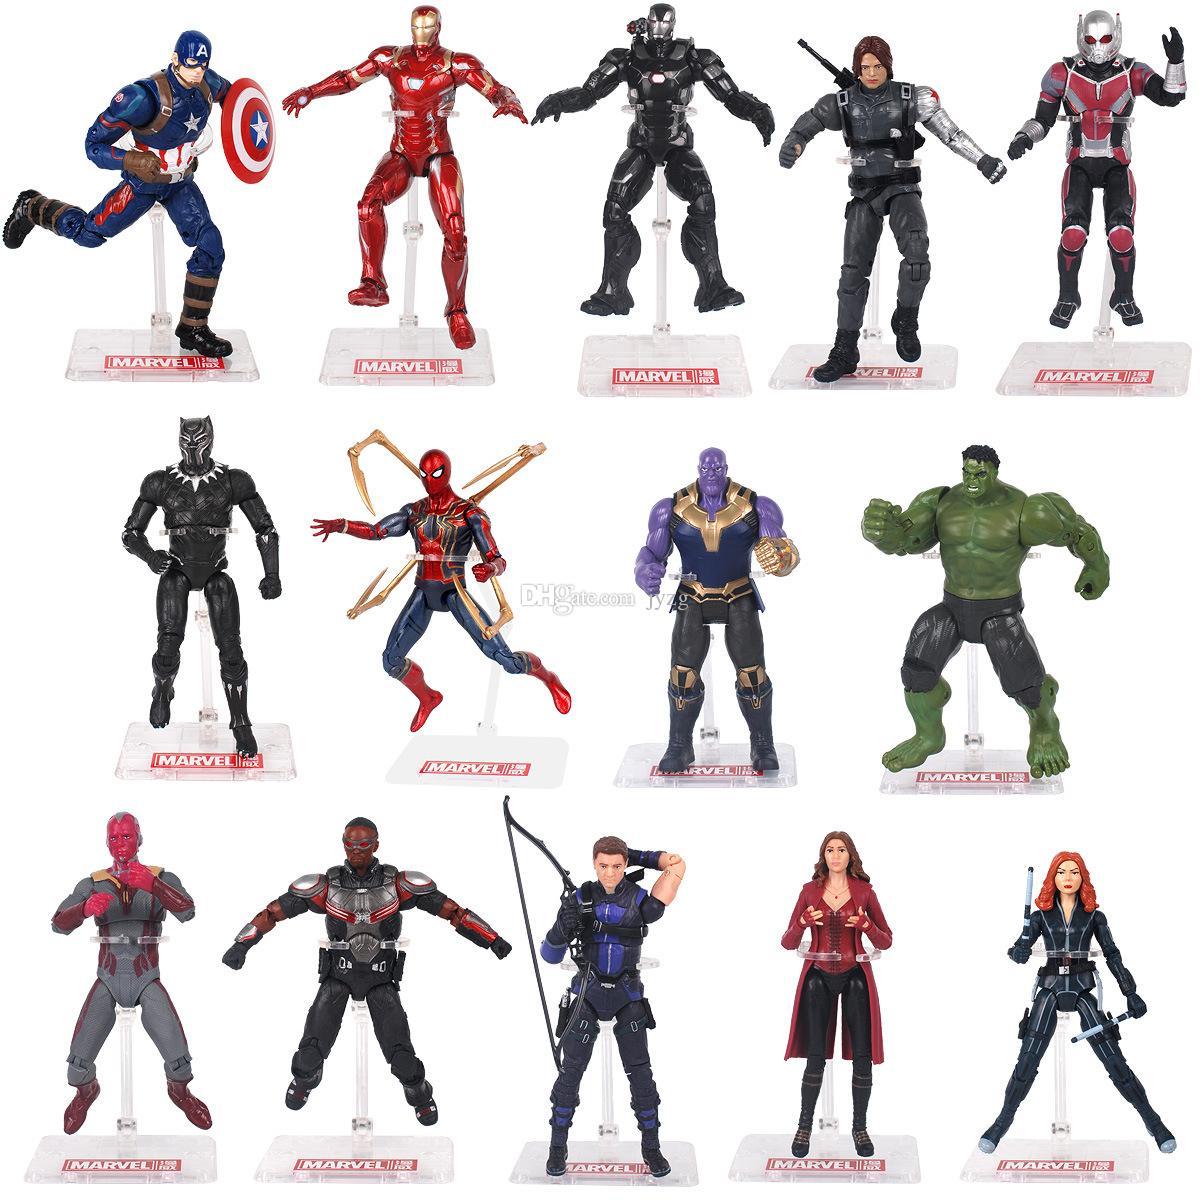 2019 avengers: endgame high quality pvc action figures marvel heros